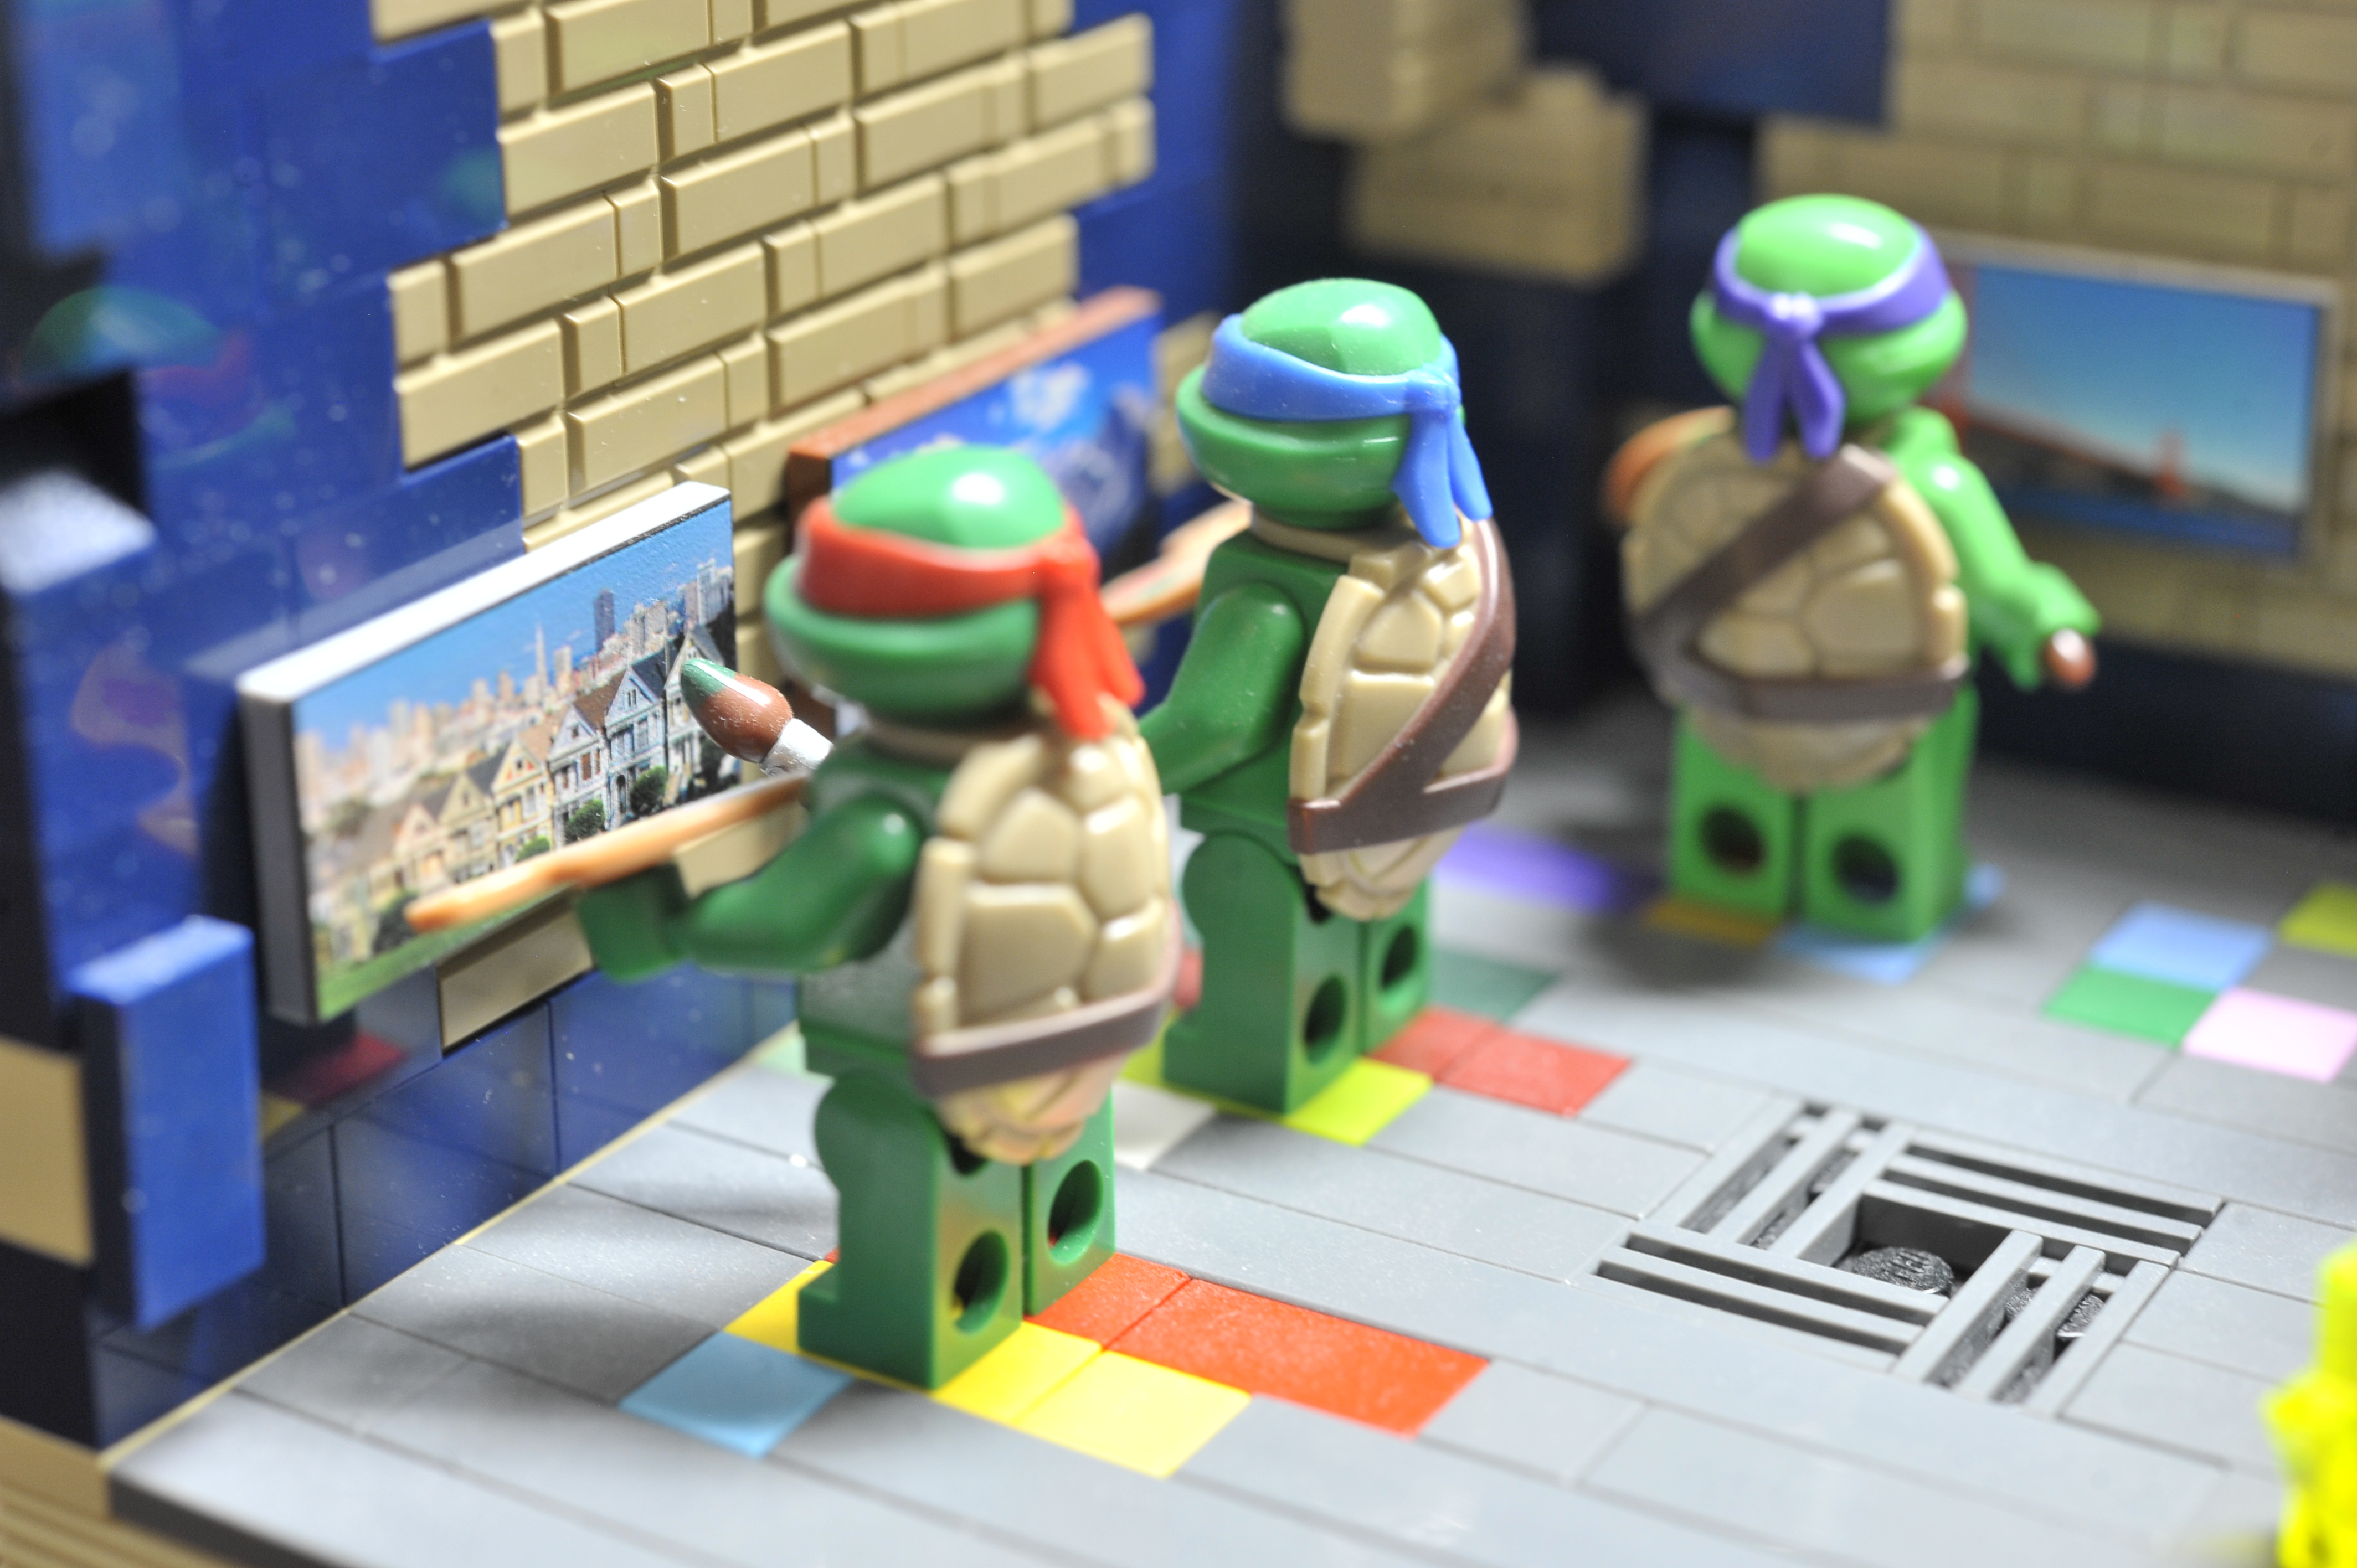 LEGO Moc Teenage Mutant Ninga Turtles by The Allergy Chef